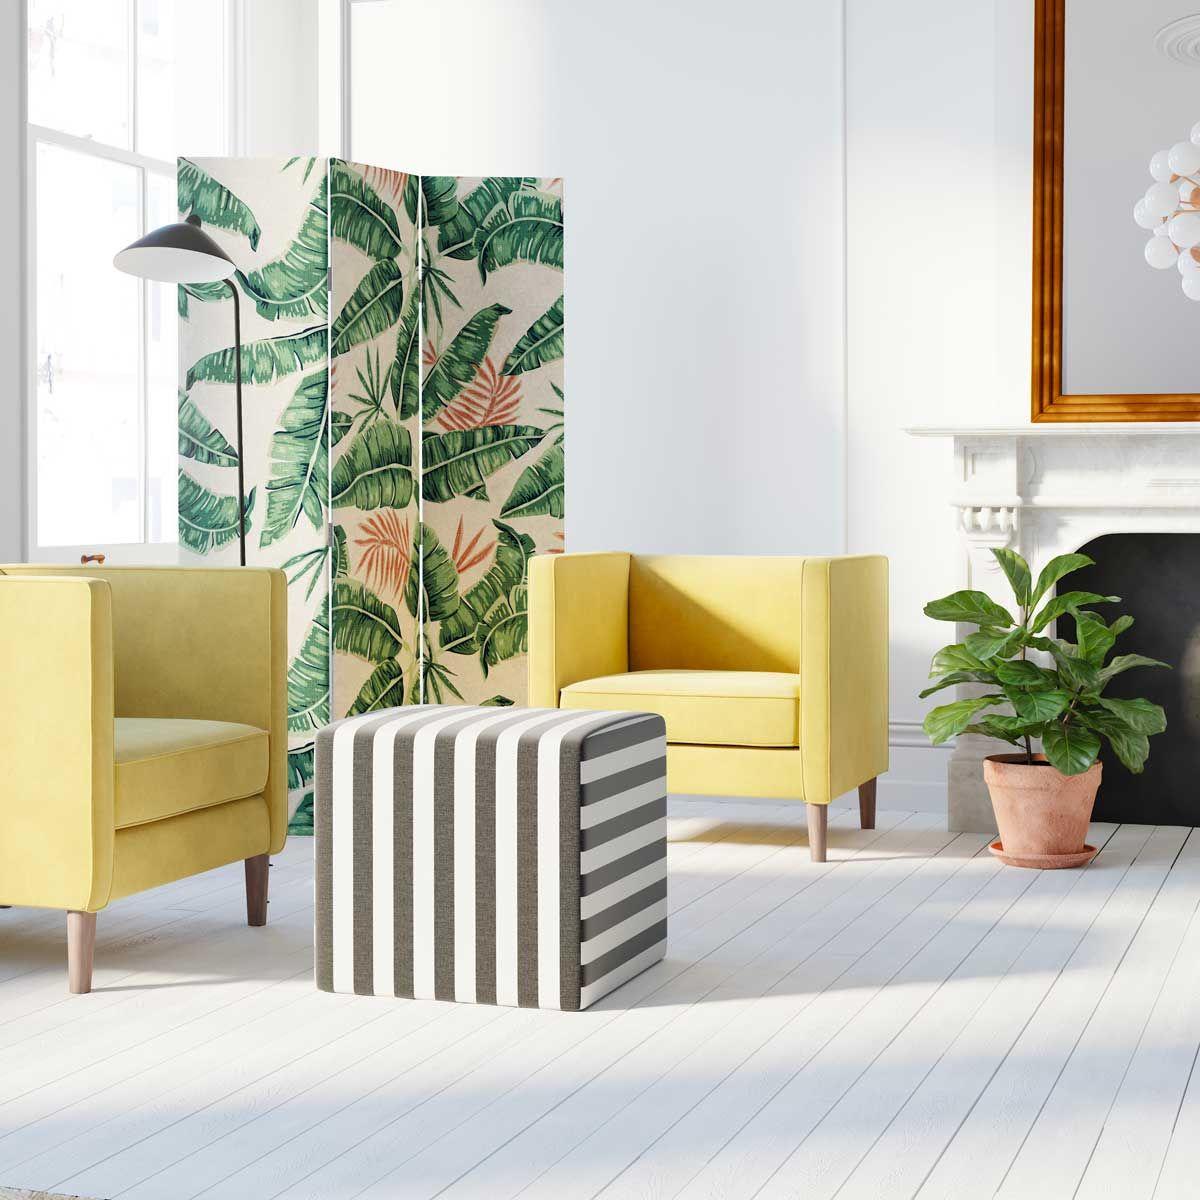 Pattern Trends 2021 Most Popular Interior Design Patterns Next Year Popular Interior Design Interior Design Popular Interiors